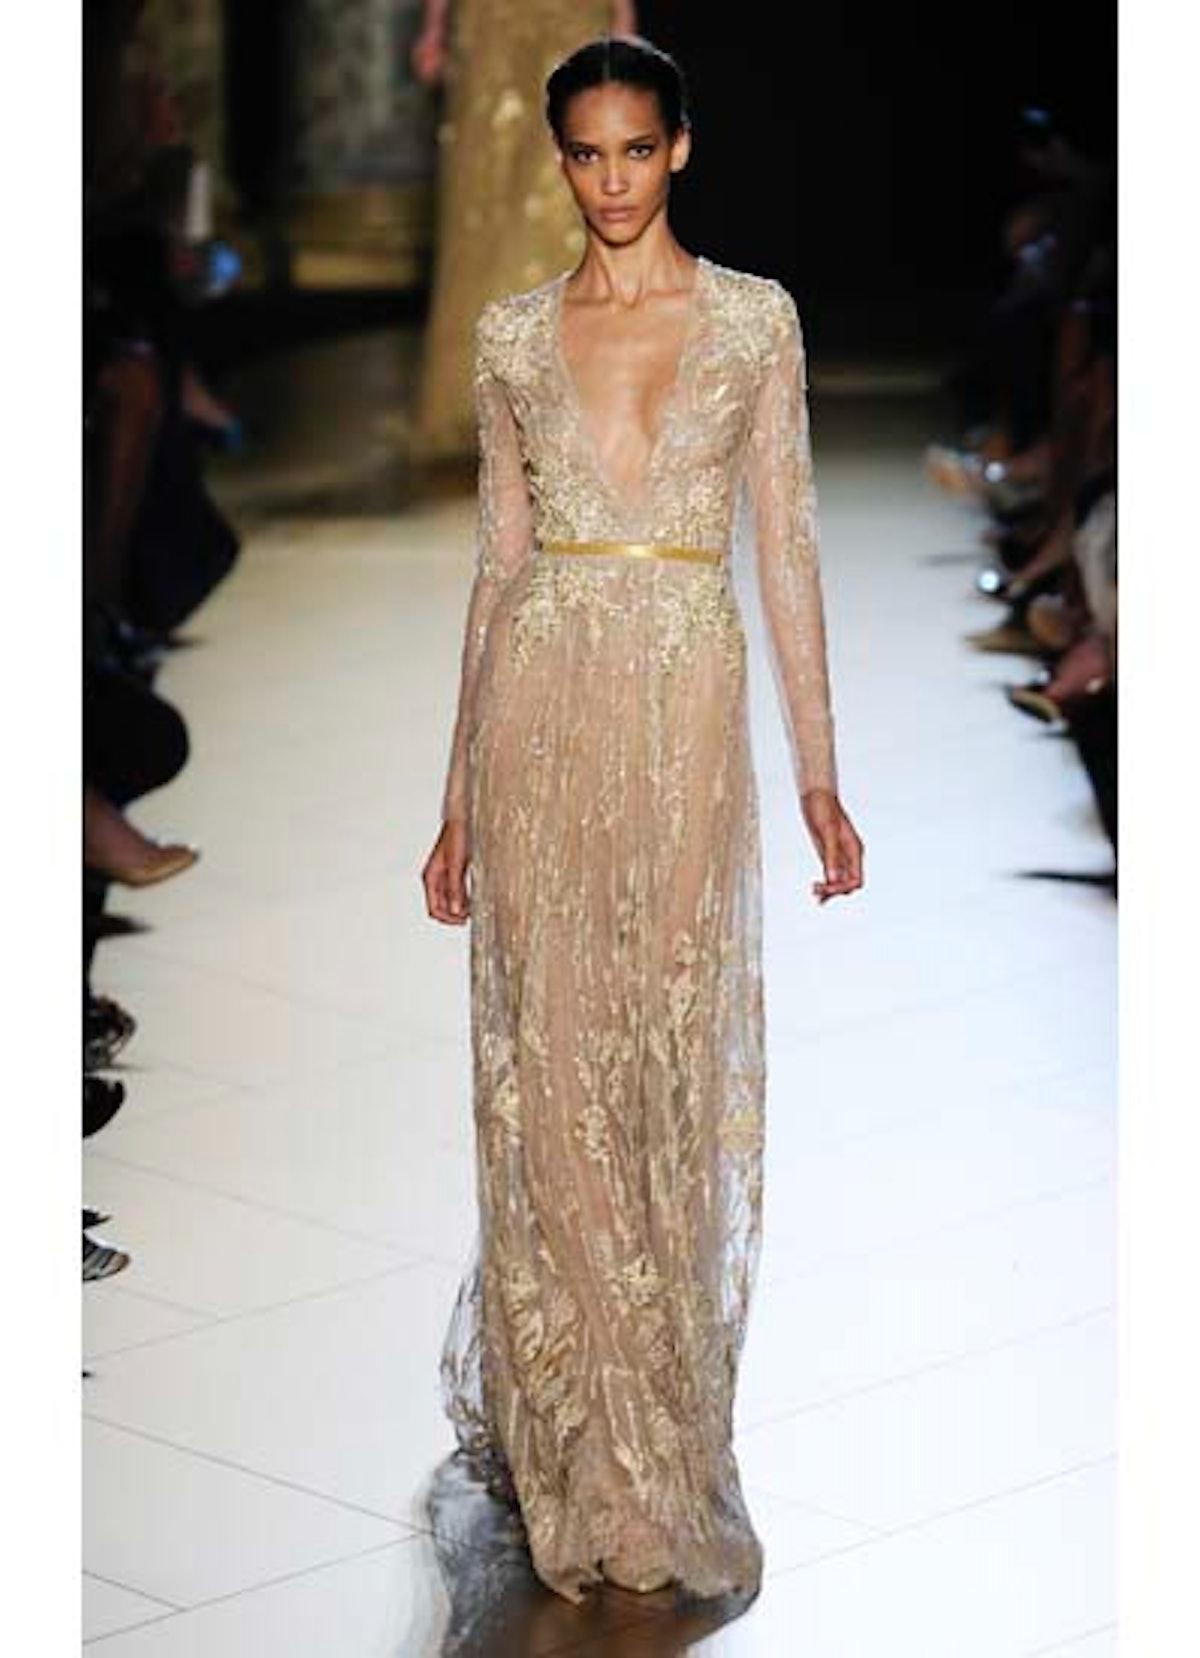 fass-elie-saab-couture-2012-runway-41-v.jpg